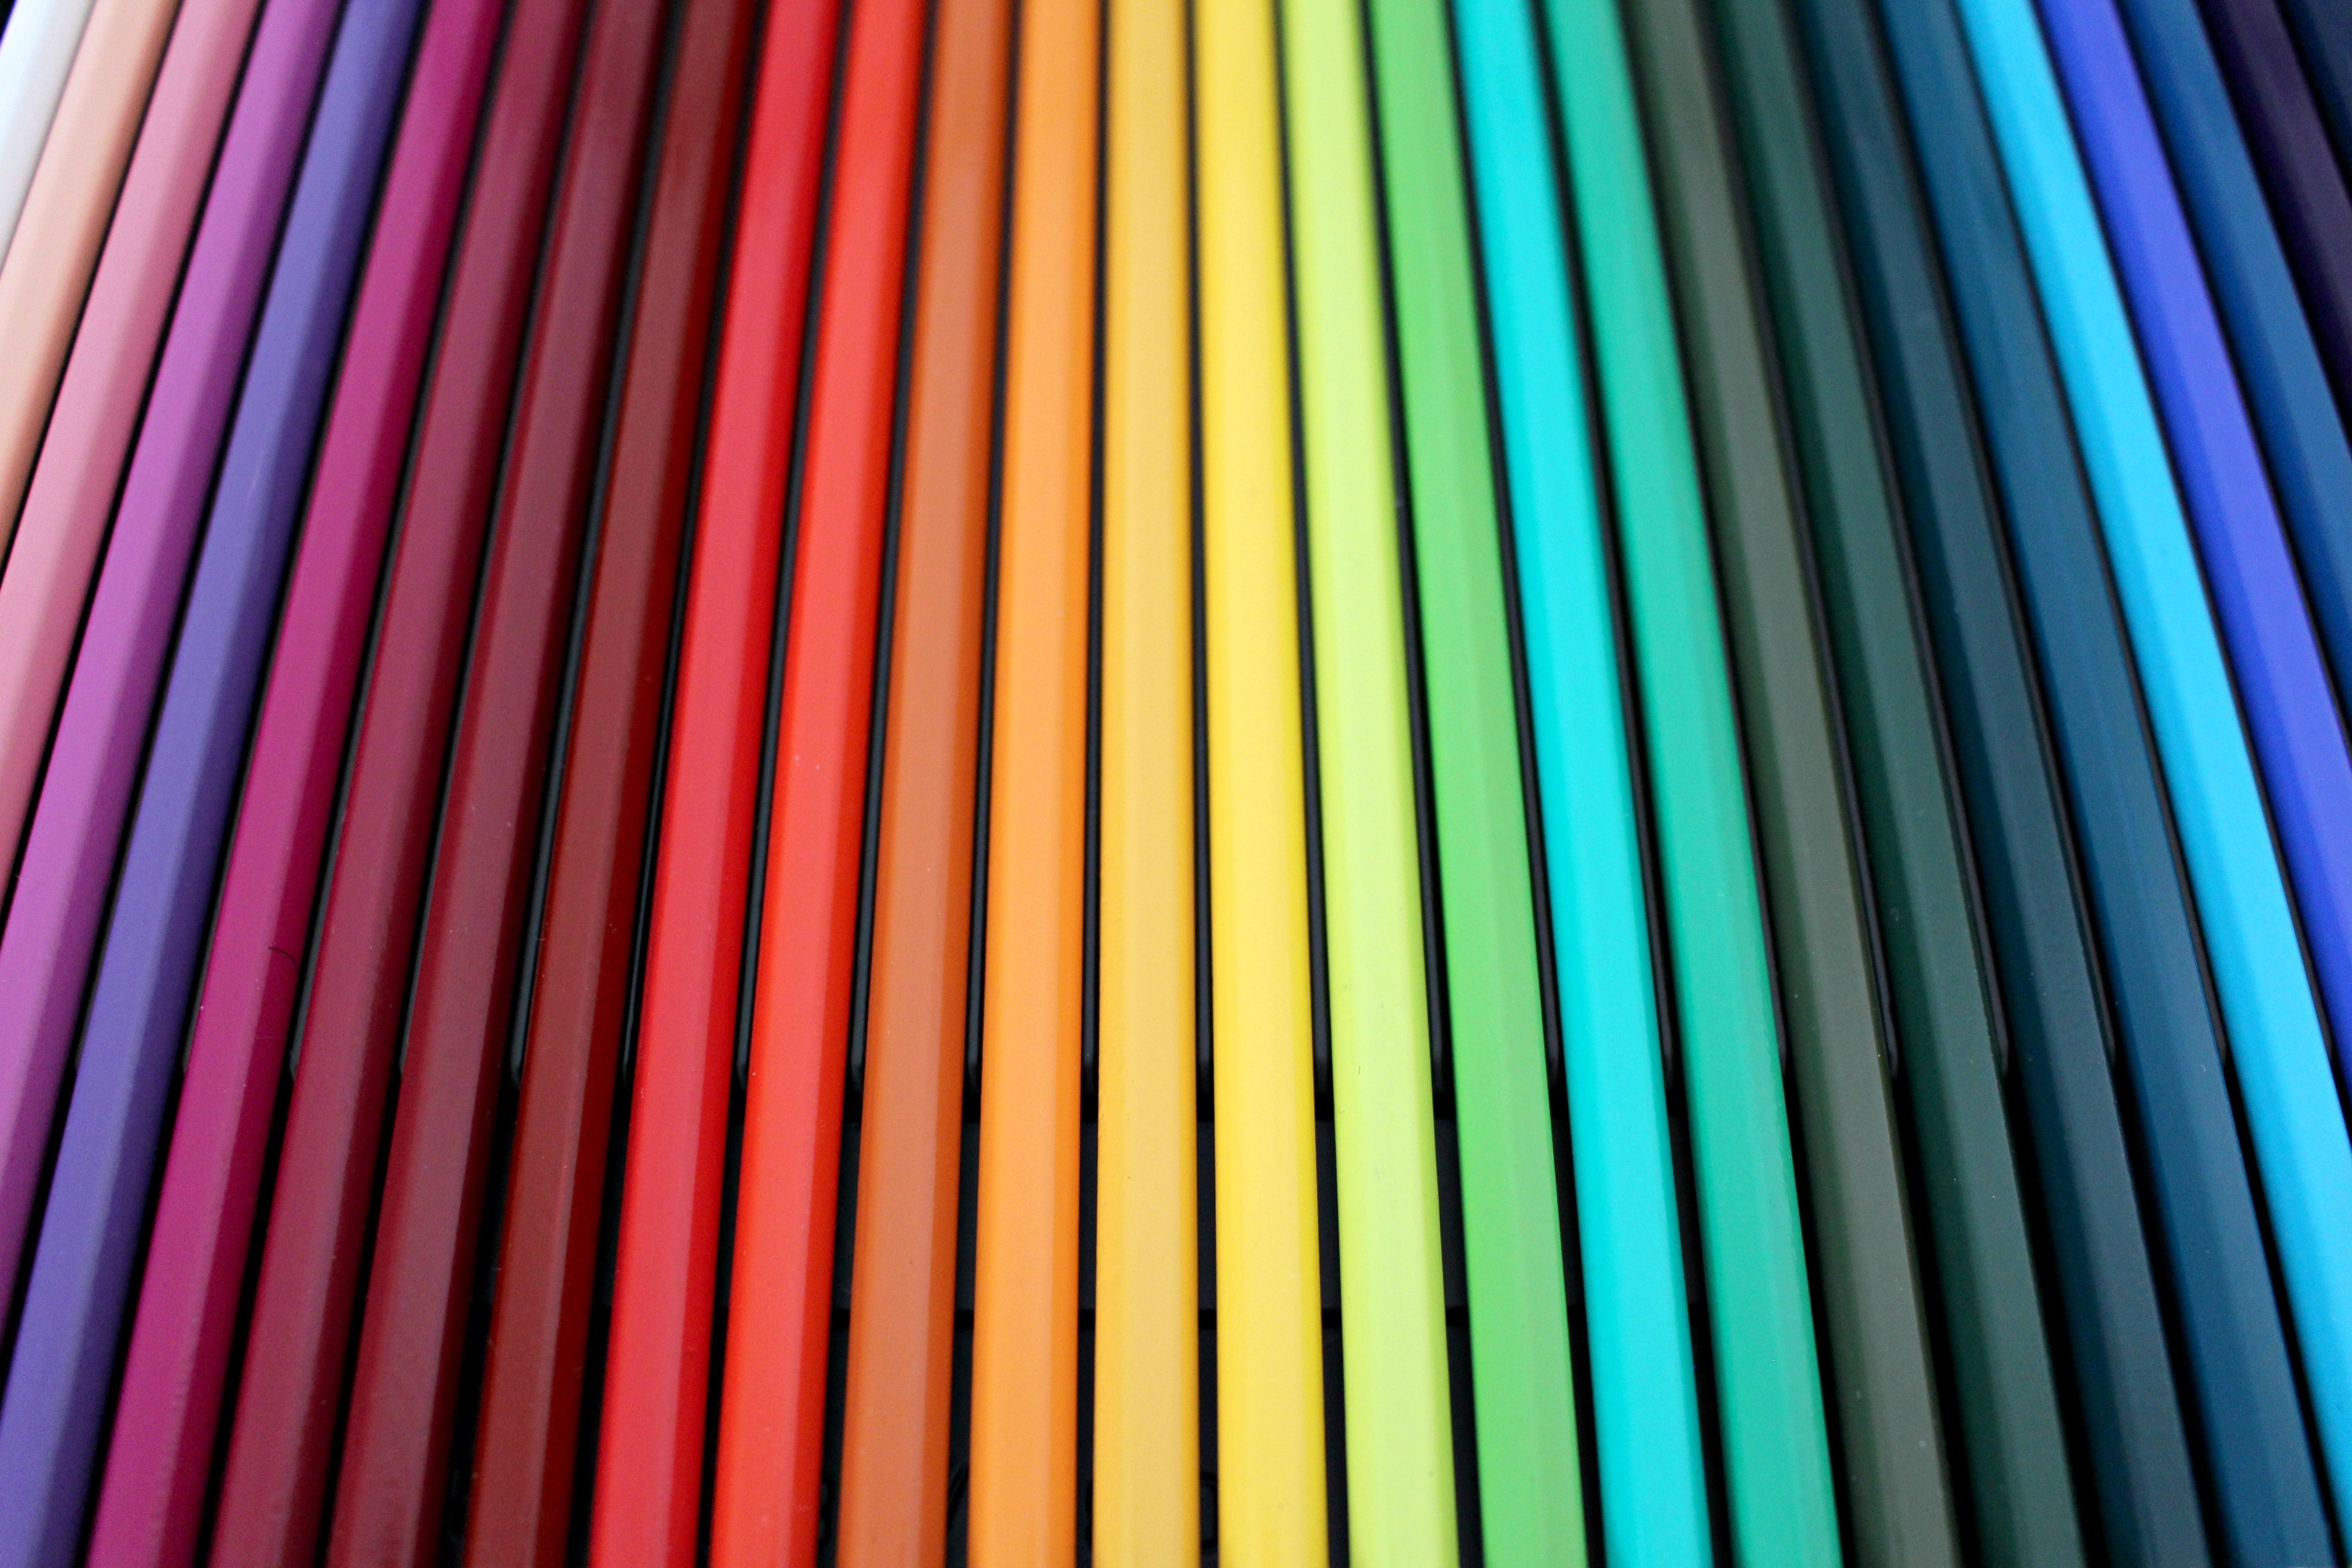 coloring free photos stock images   freephotos cc